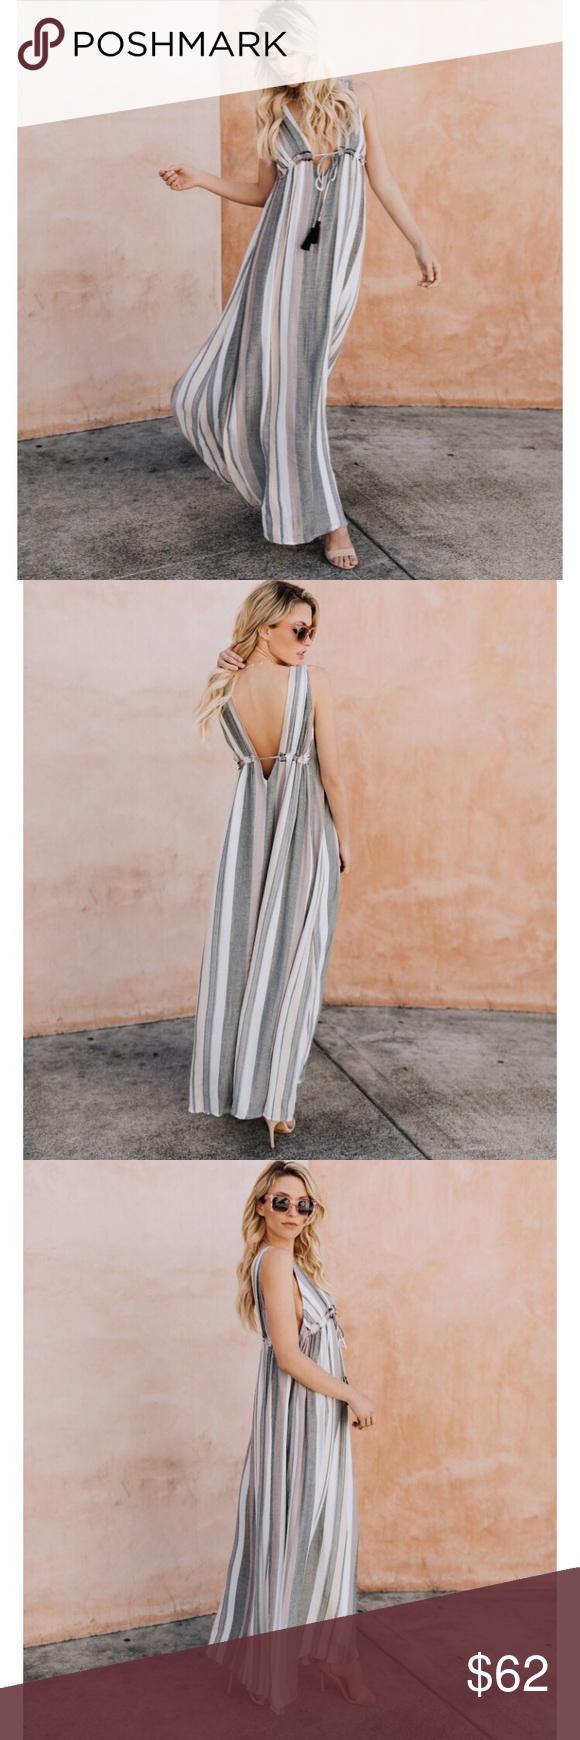 Vici Collection Saachi Striped Maxi Dress Striped Maxi Dresses Fashion Maxi Dress [ 1740 x 580 Pixel ]